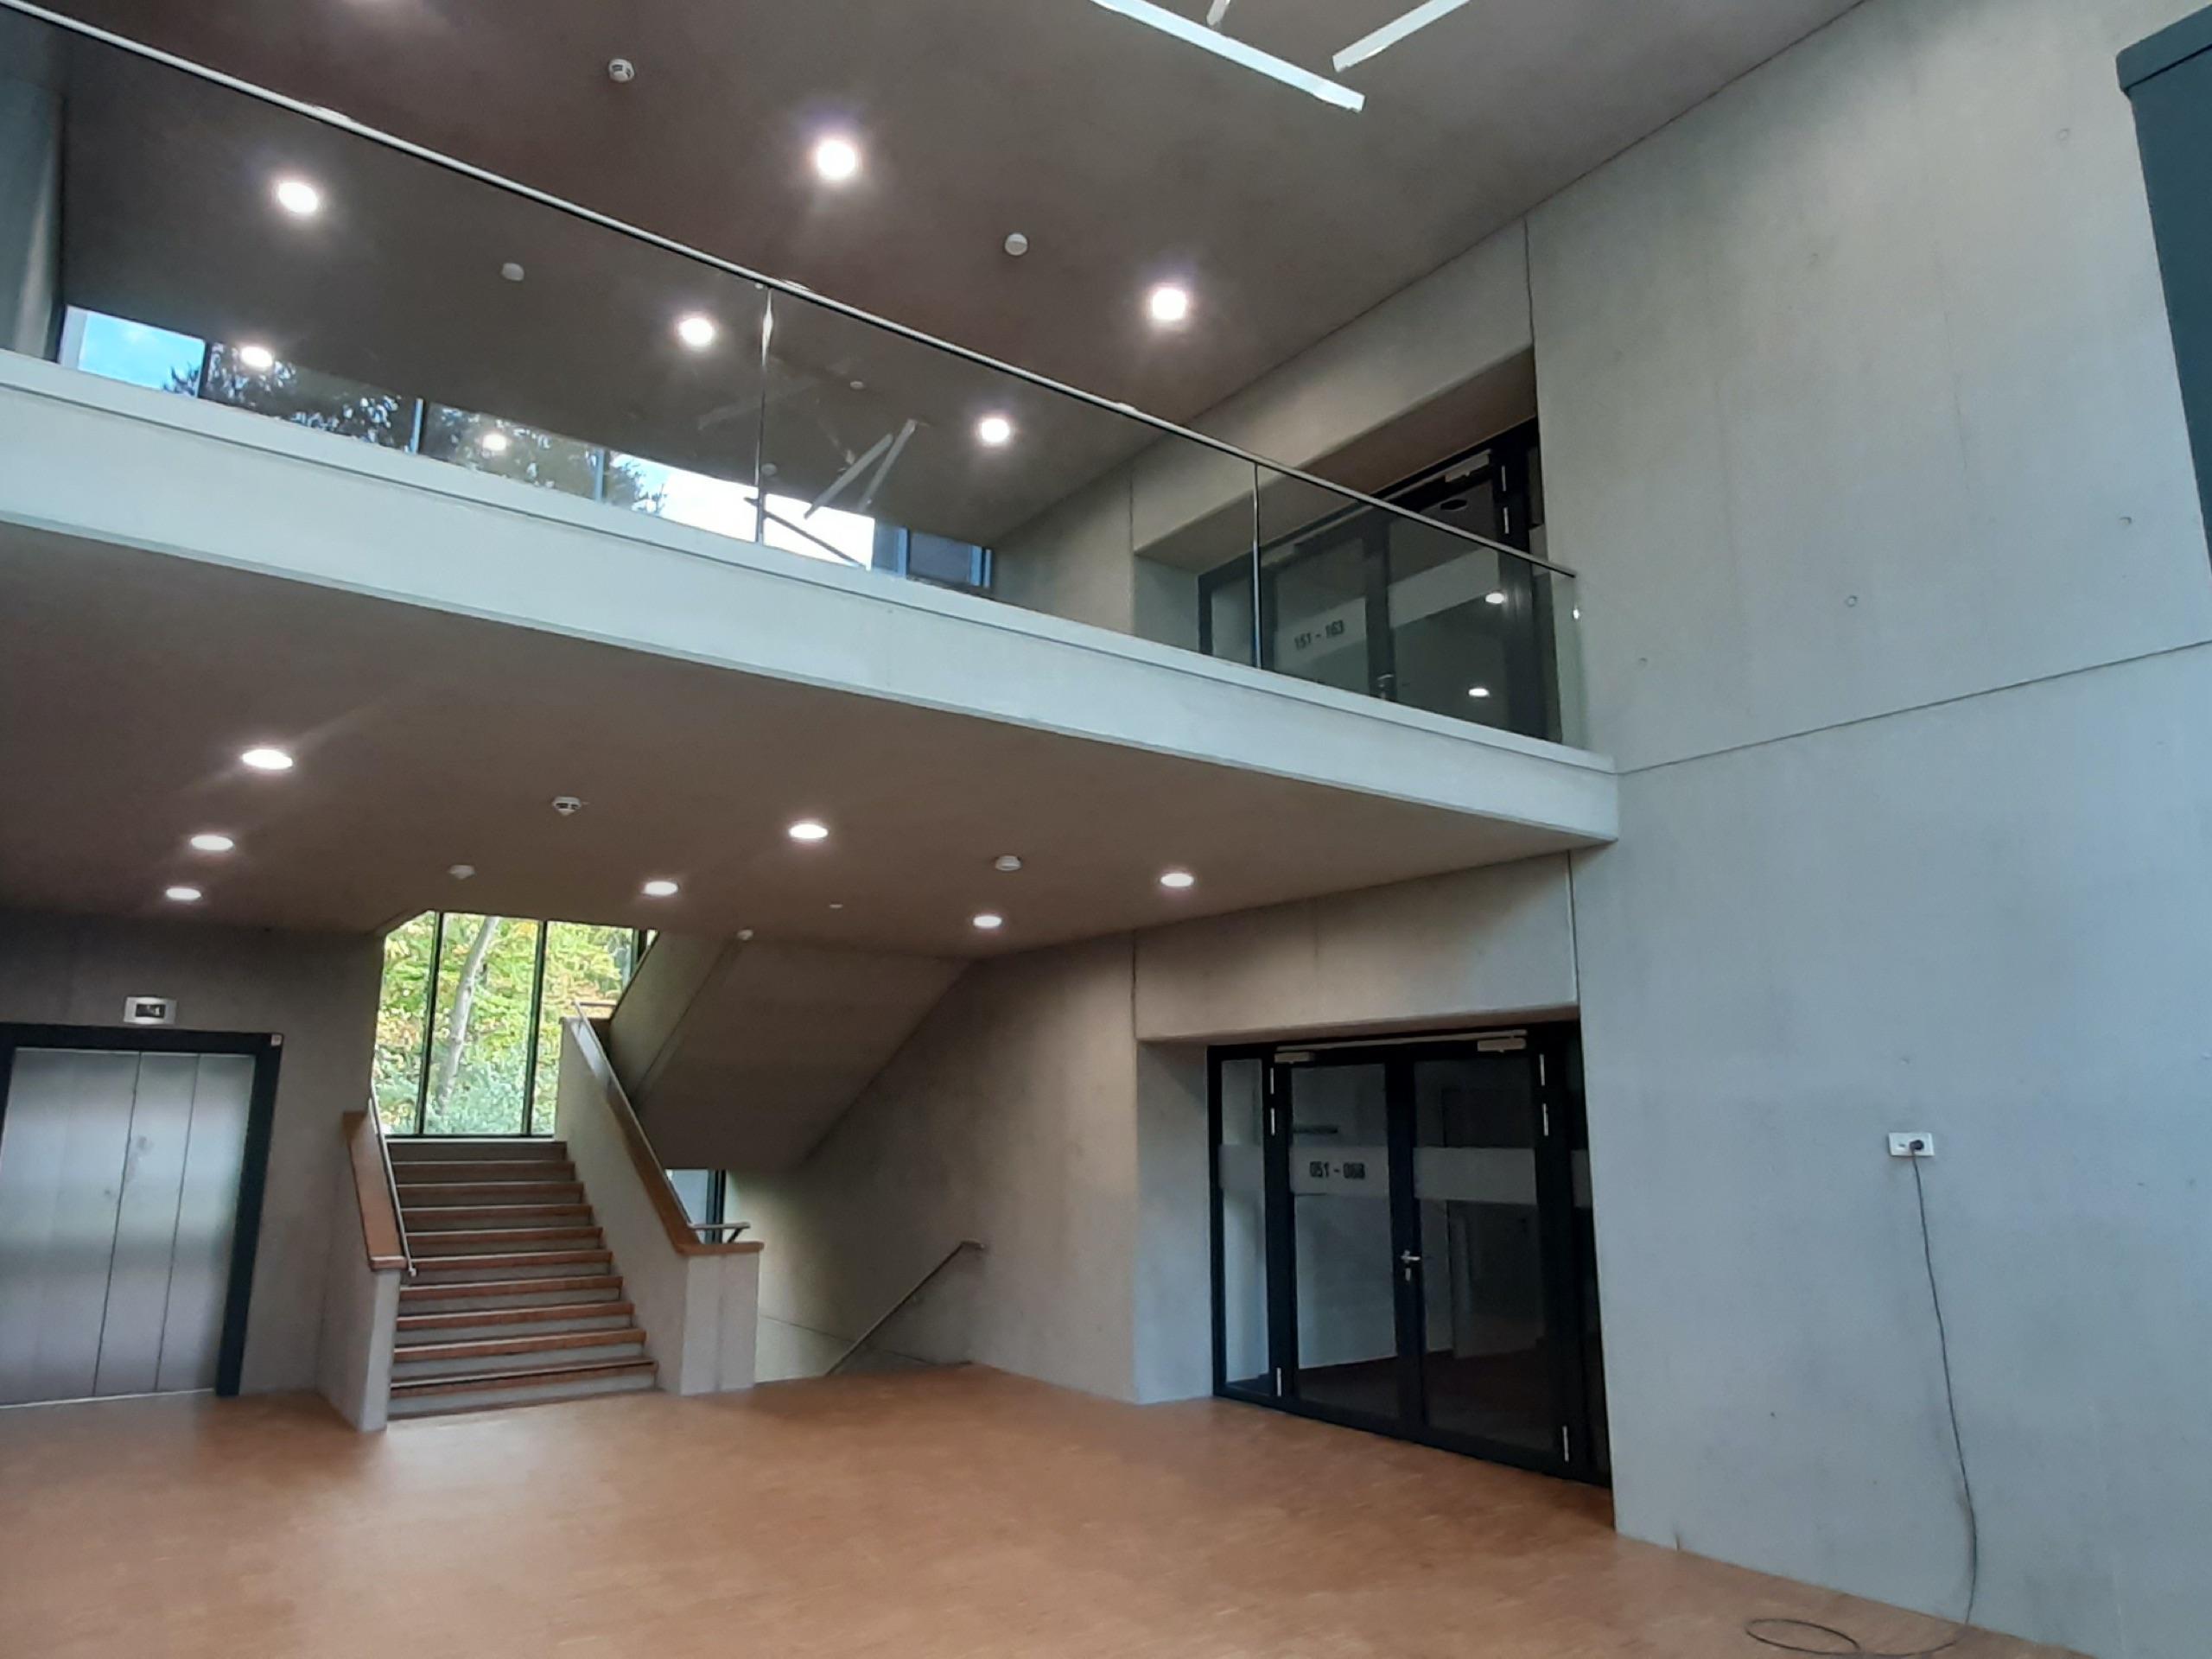 Canisius Campus Dortmund Betonkosmetik nachher 2